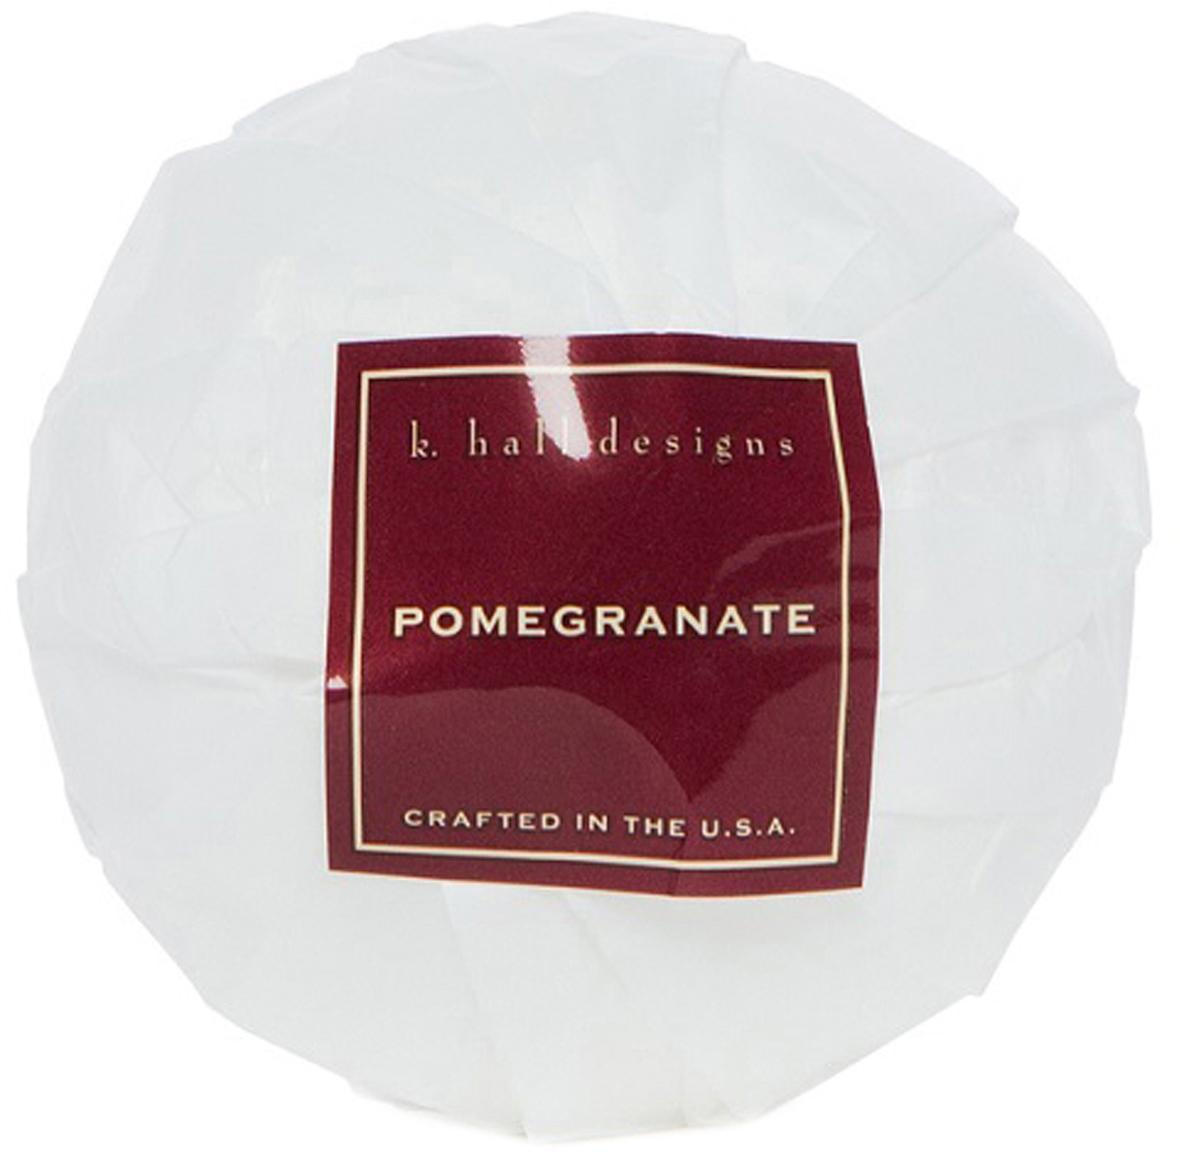 Badekugel Pomegranate (Granatapfel, Apfel & Pflaume), Weiss, Ø 7 x H 7 cm